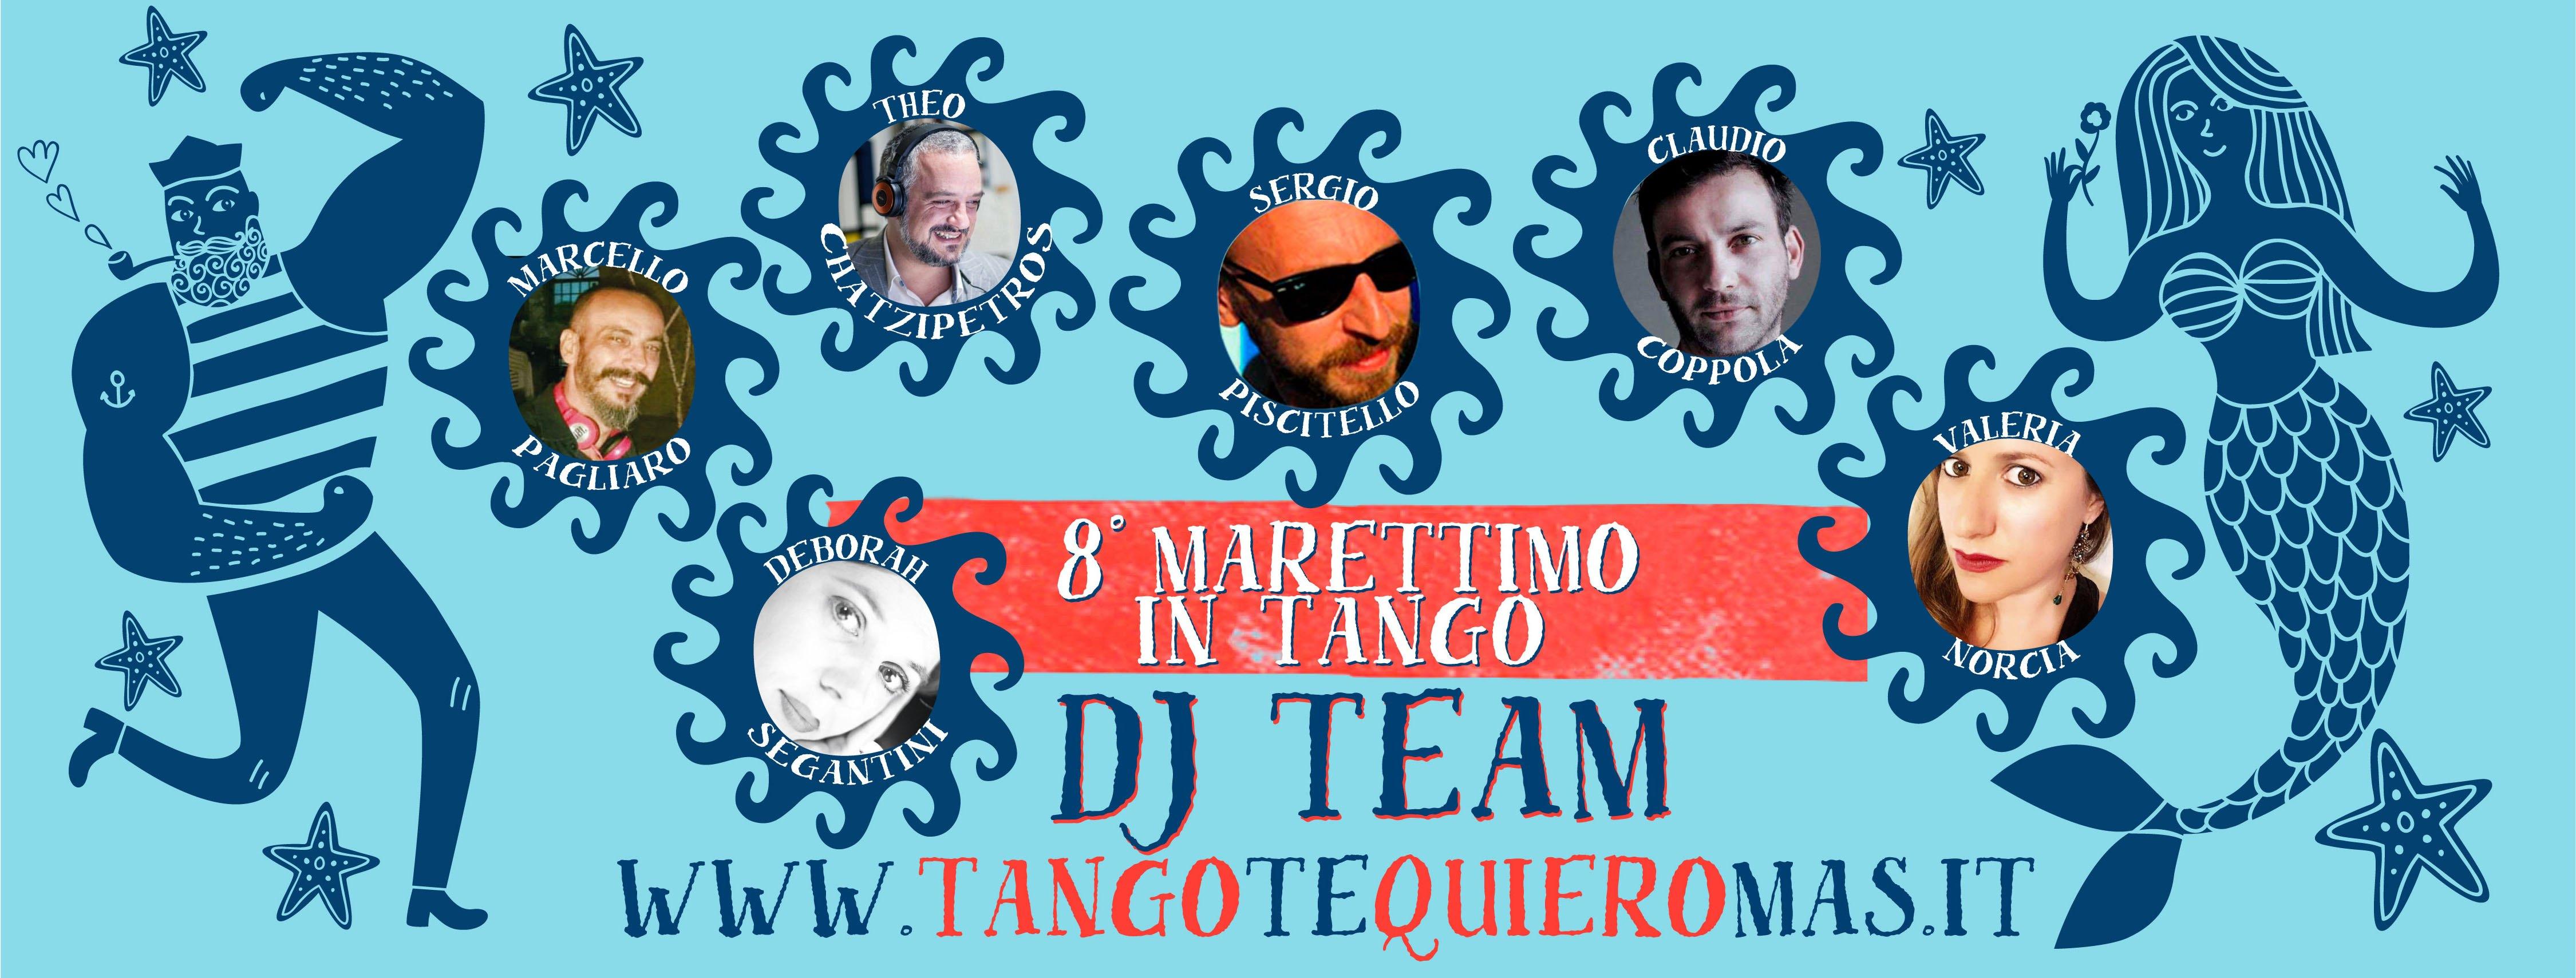 Tango Te Quiero Mas Retro